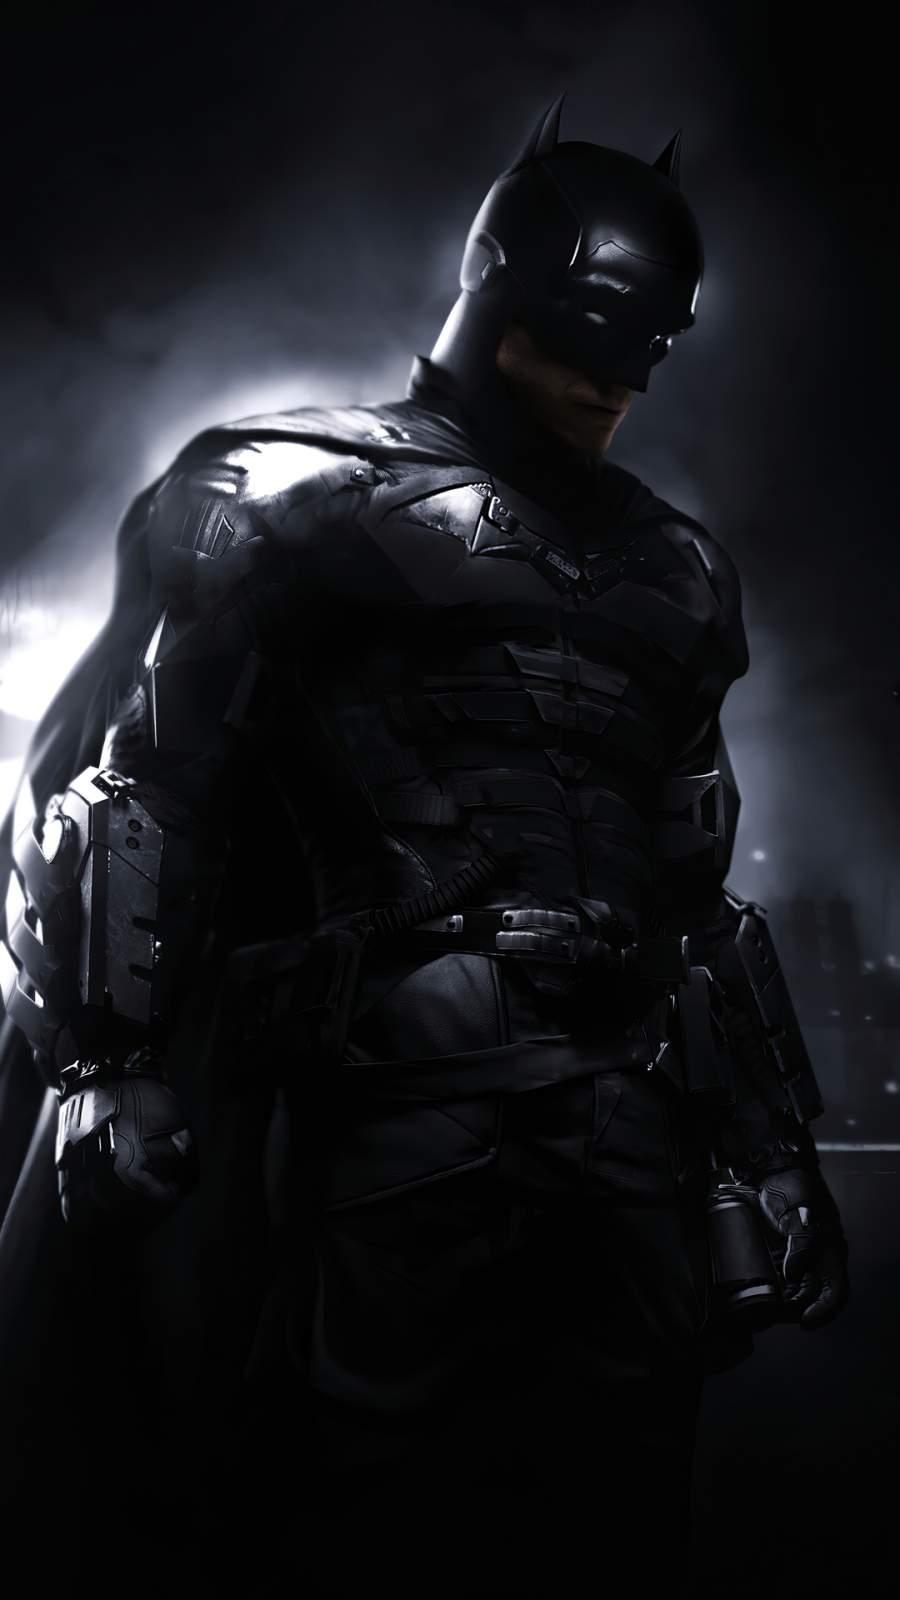 2020 Batman Robert Pattinson iPhone Wallpaper